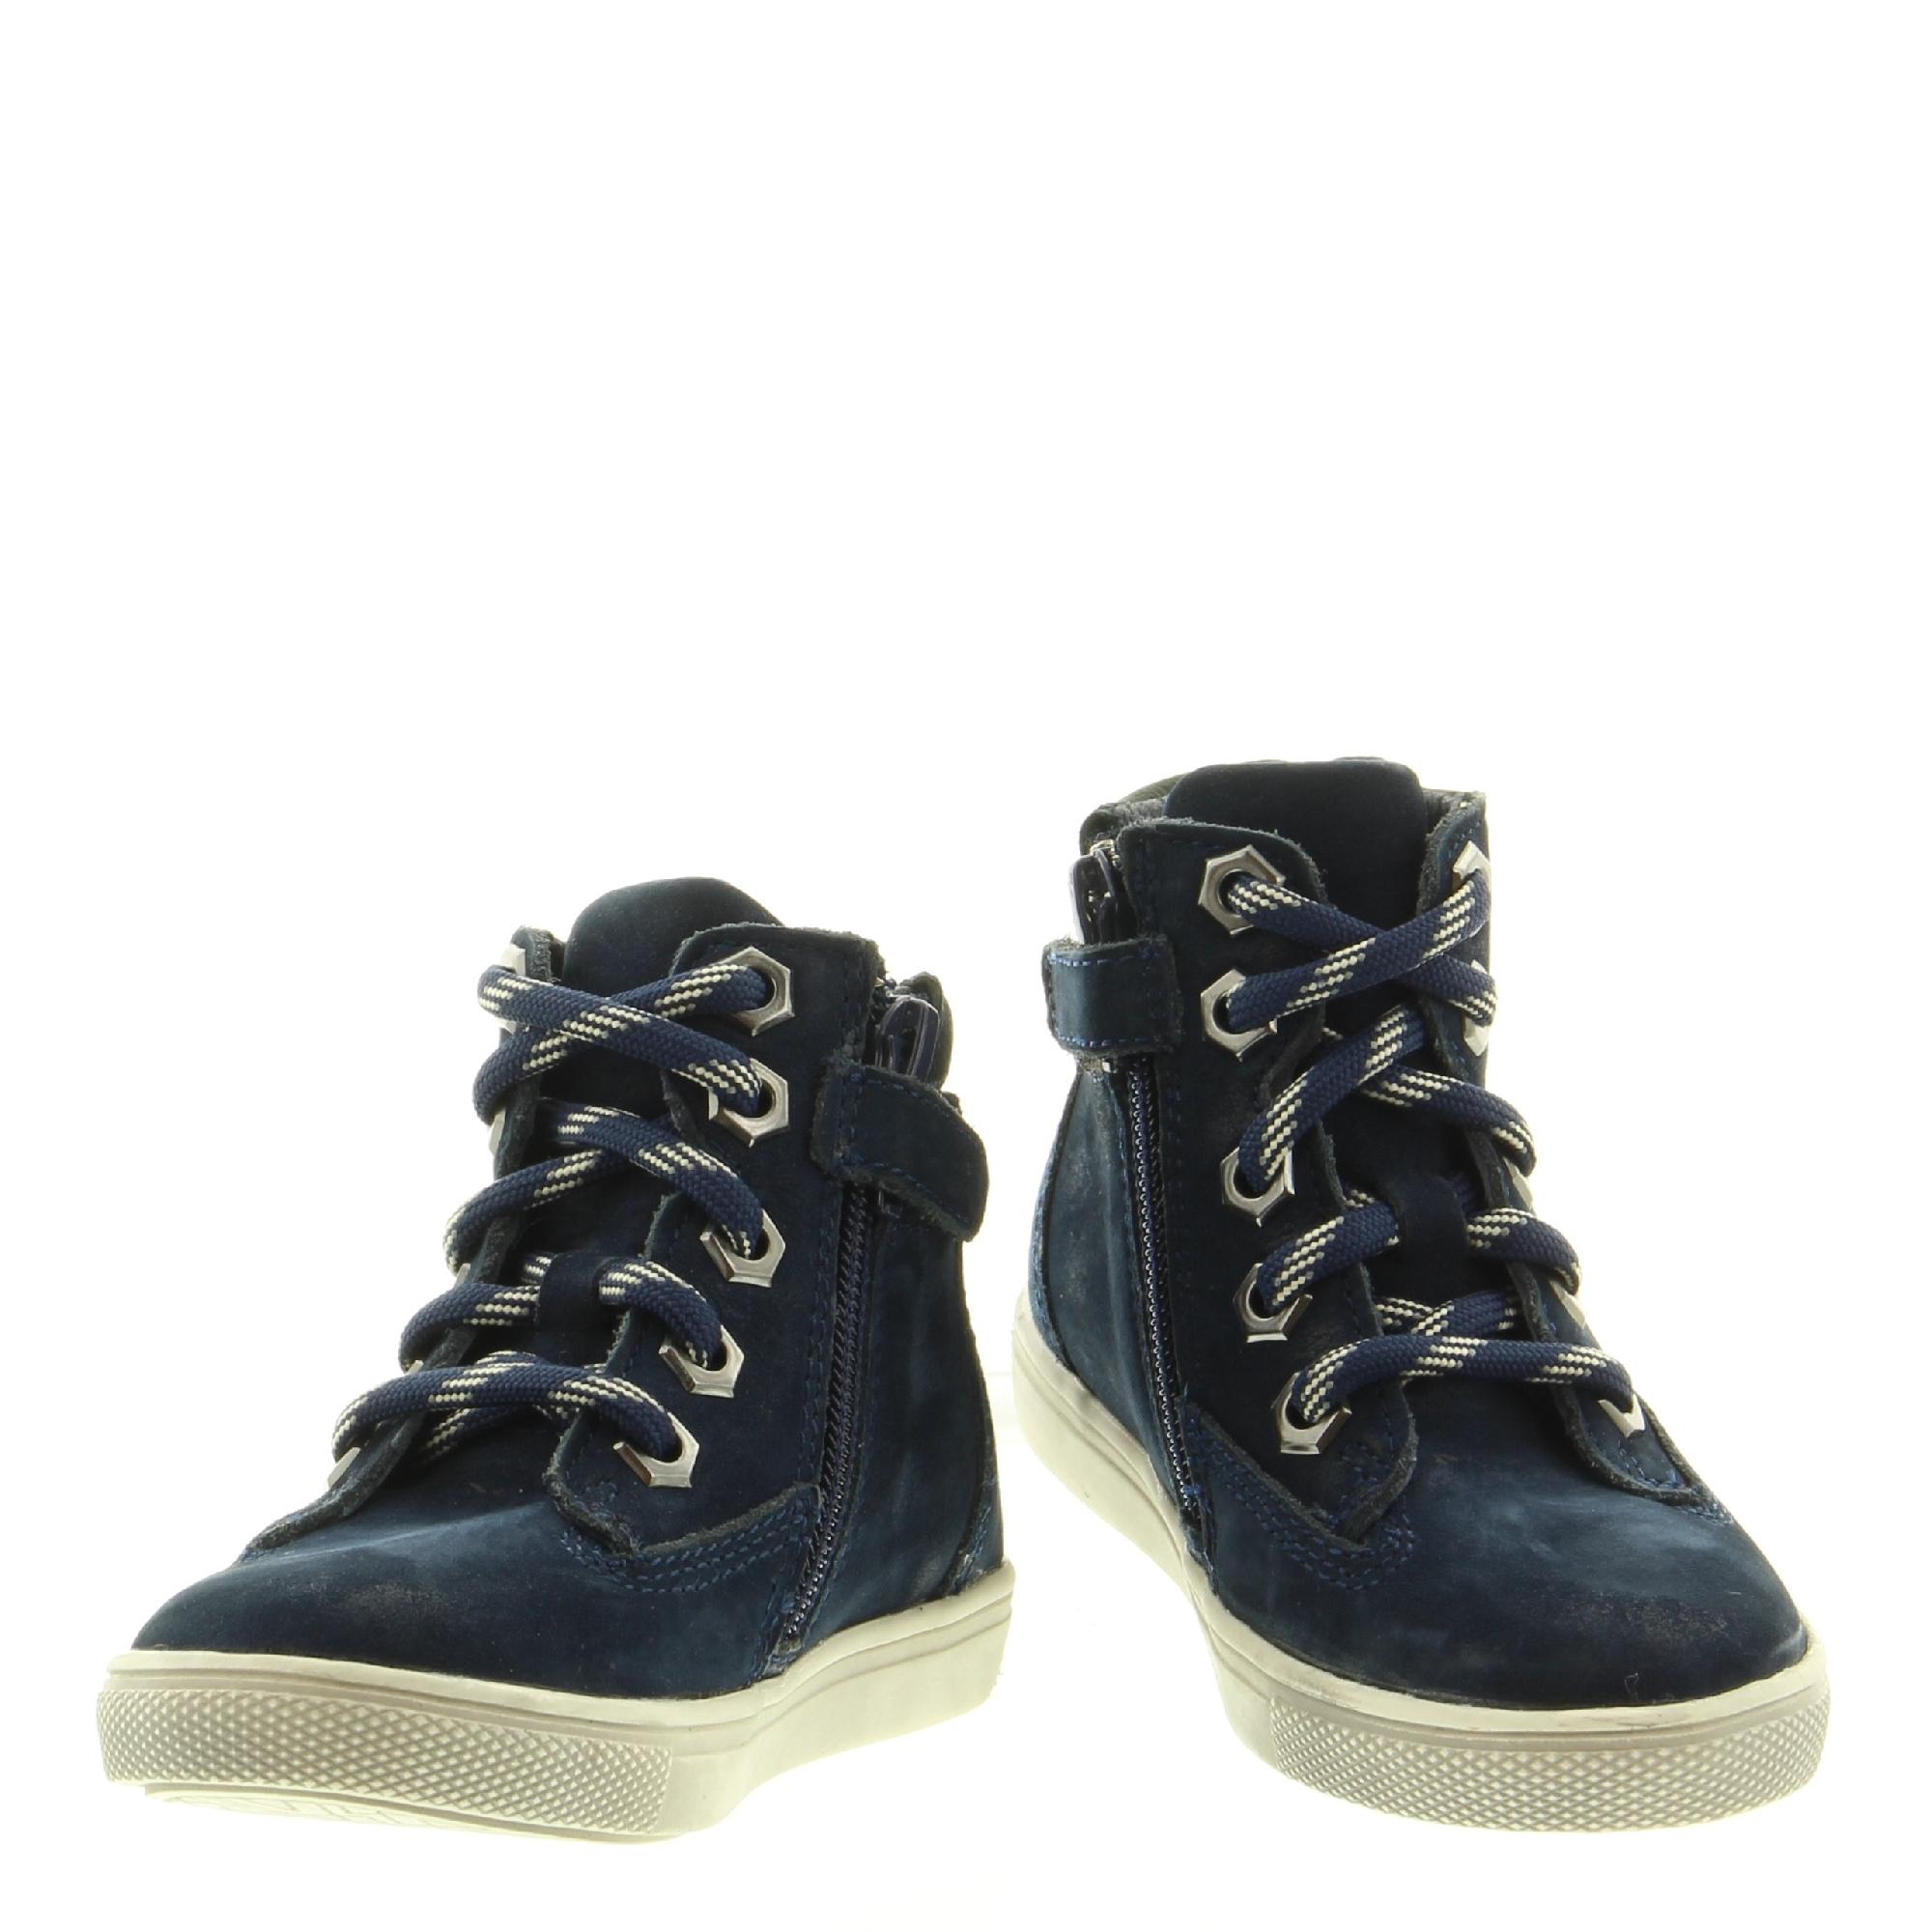 Twins Trackstyle 319801 129 Dark Blue